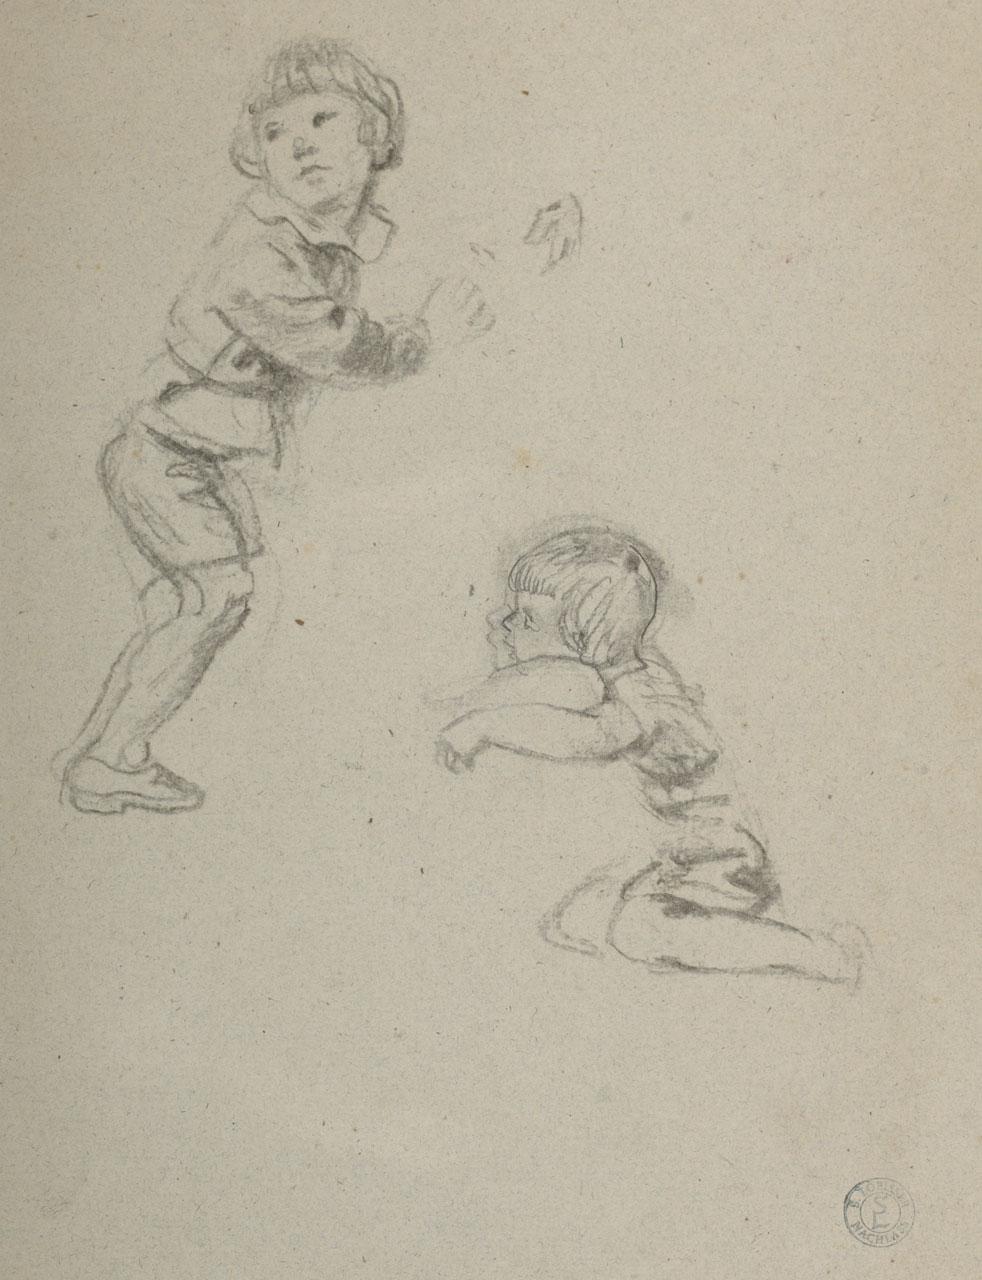 Switbert Lobisser (1878-1943), Two Boys, around 1930, pencil, 28x22cm, estate stamp